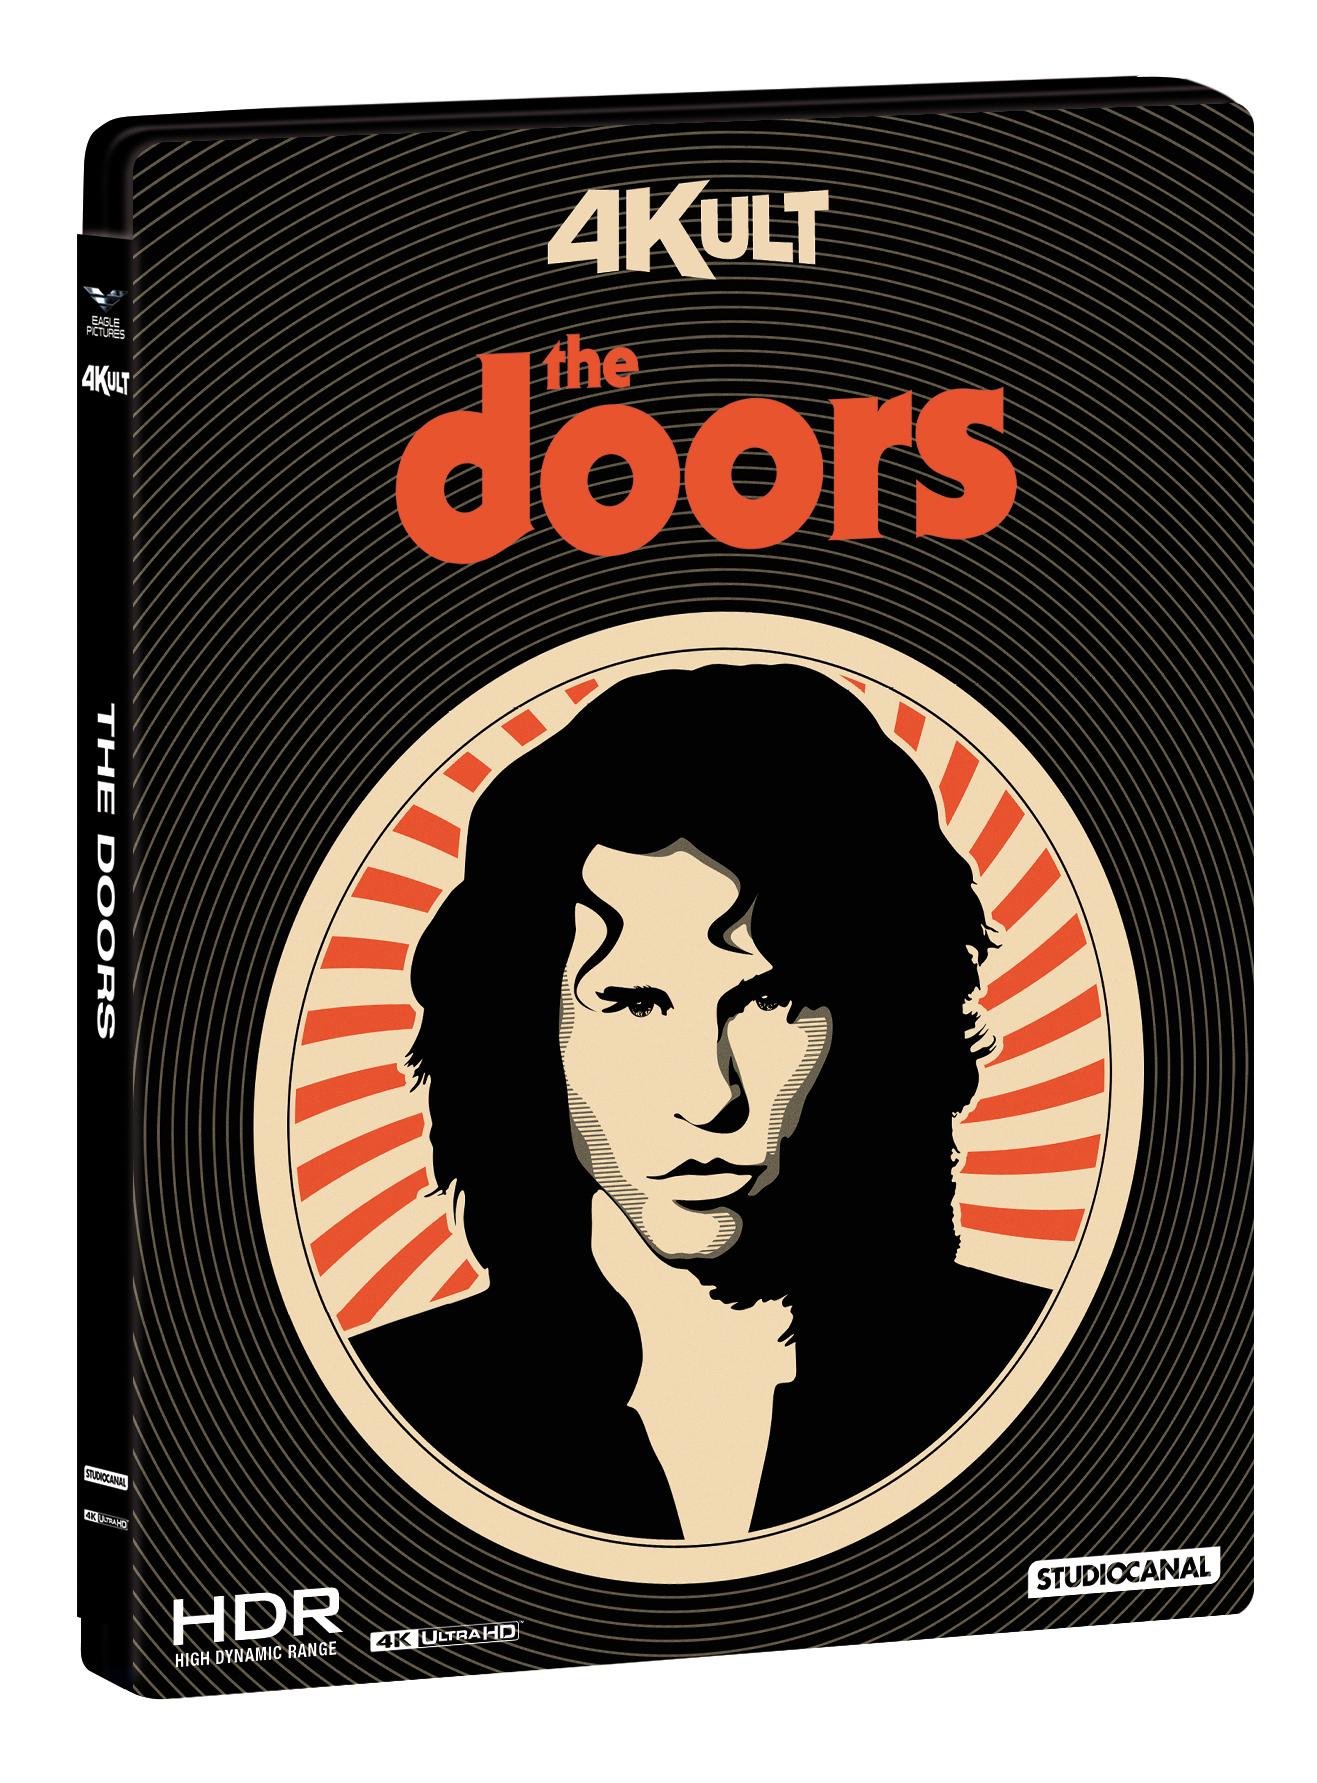 THE DOORS - 4KULT (BLU-RAY 4K ULTRA HD+CARD NUMERATA)